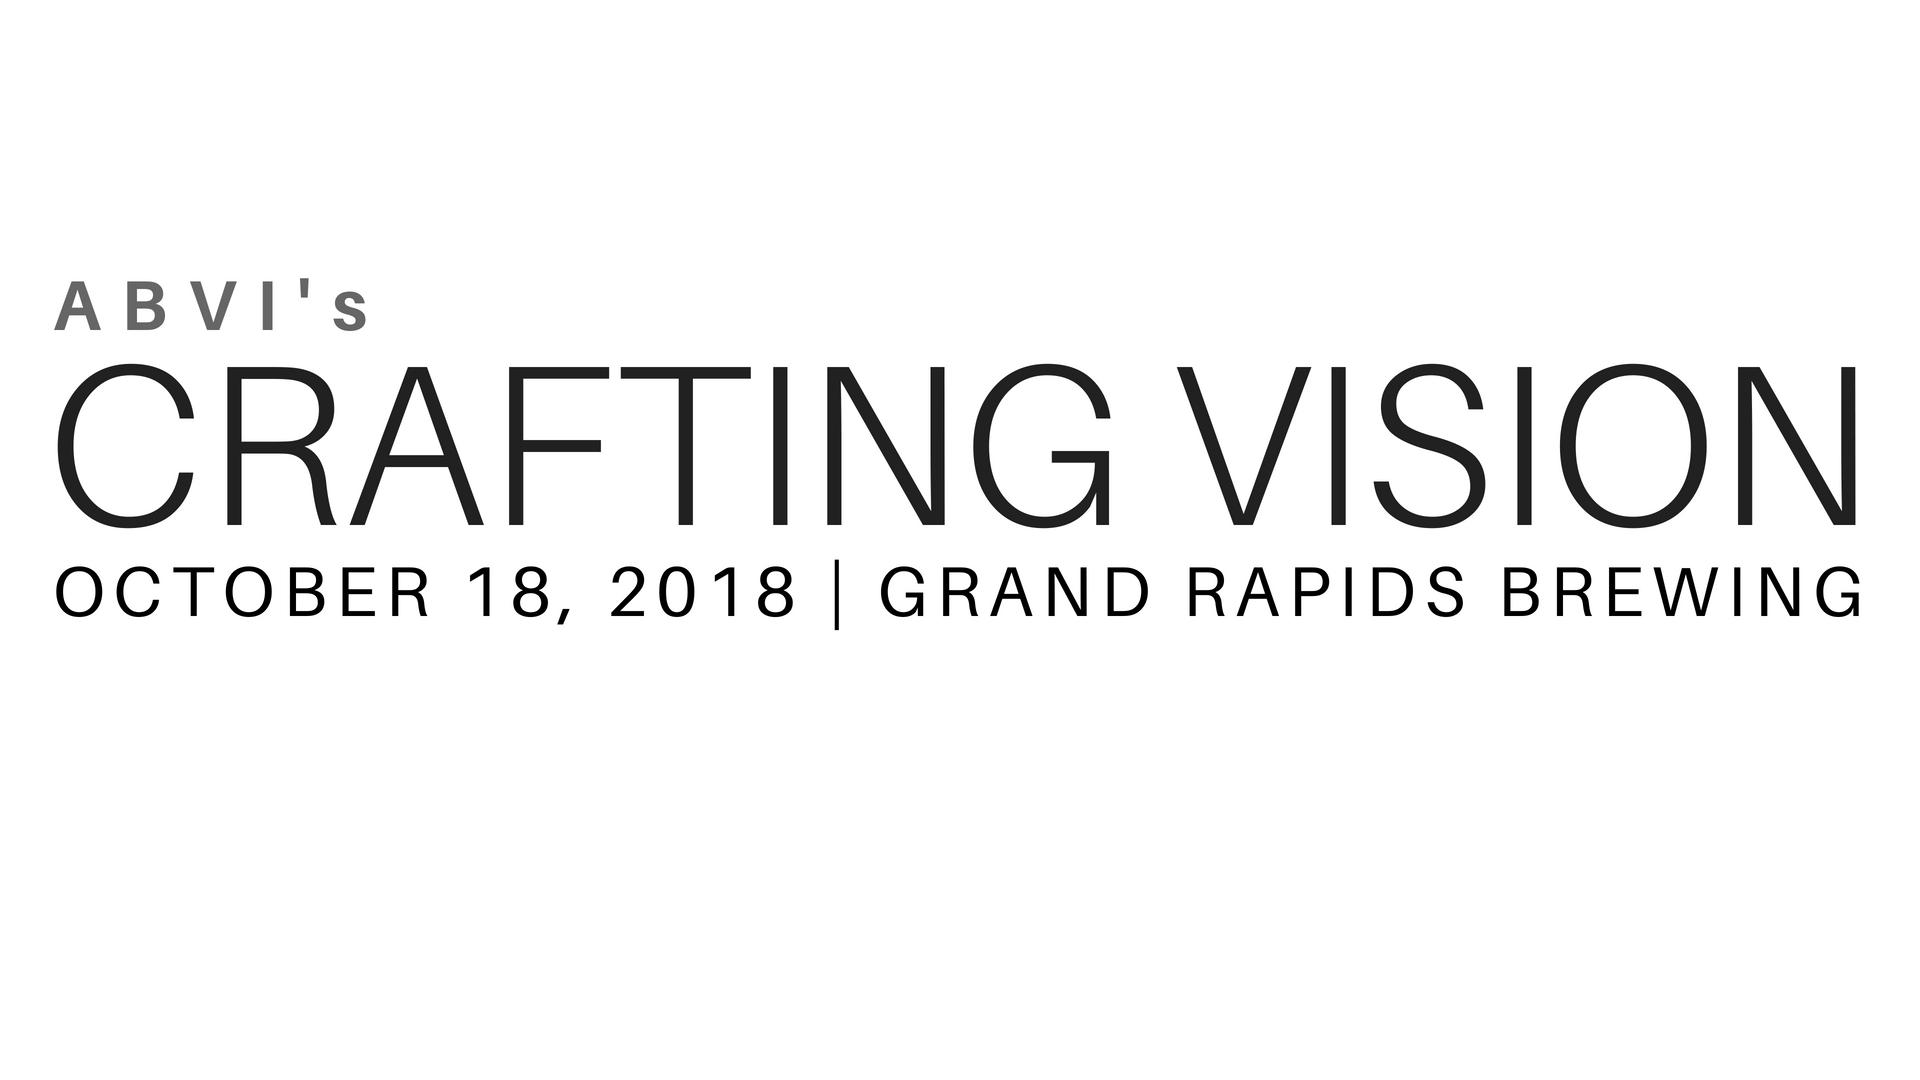 Crafting Vision Logo